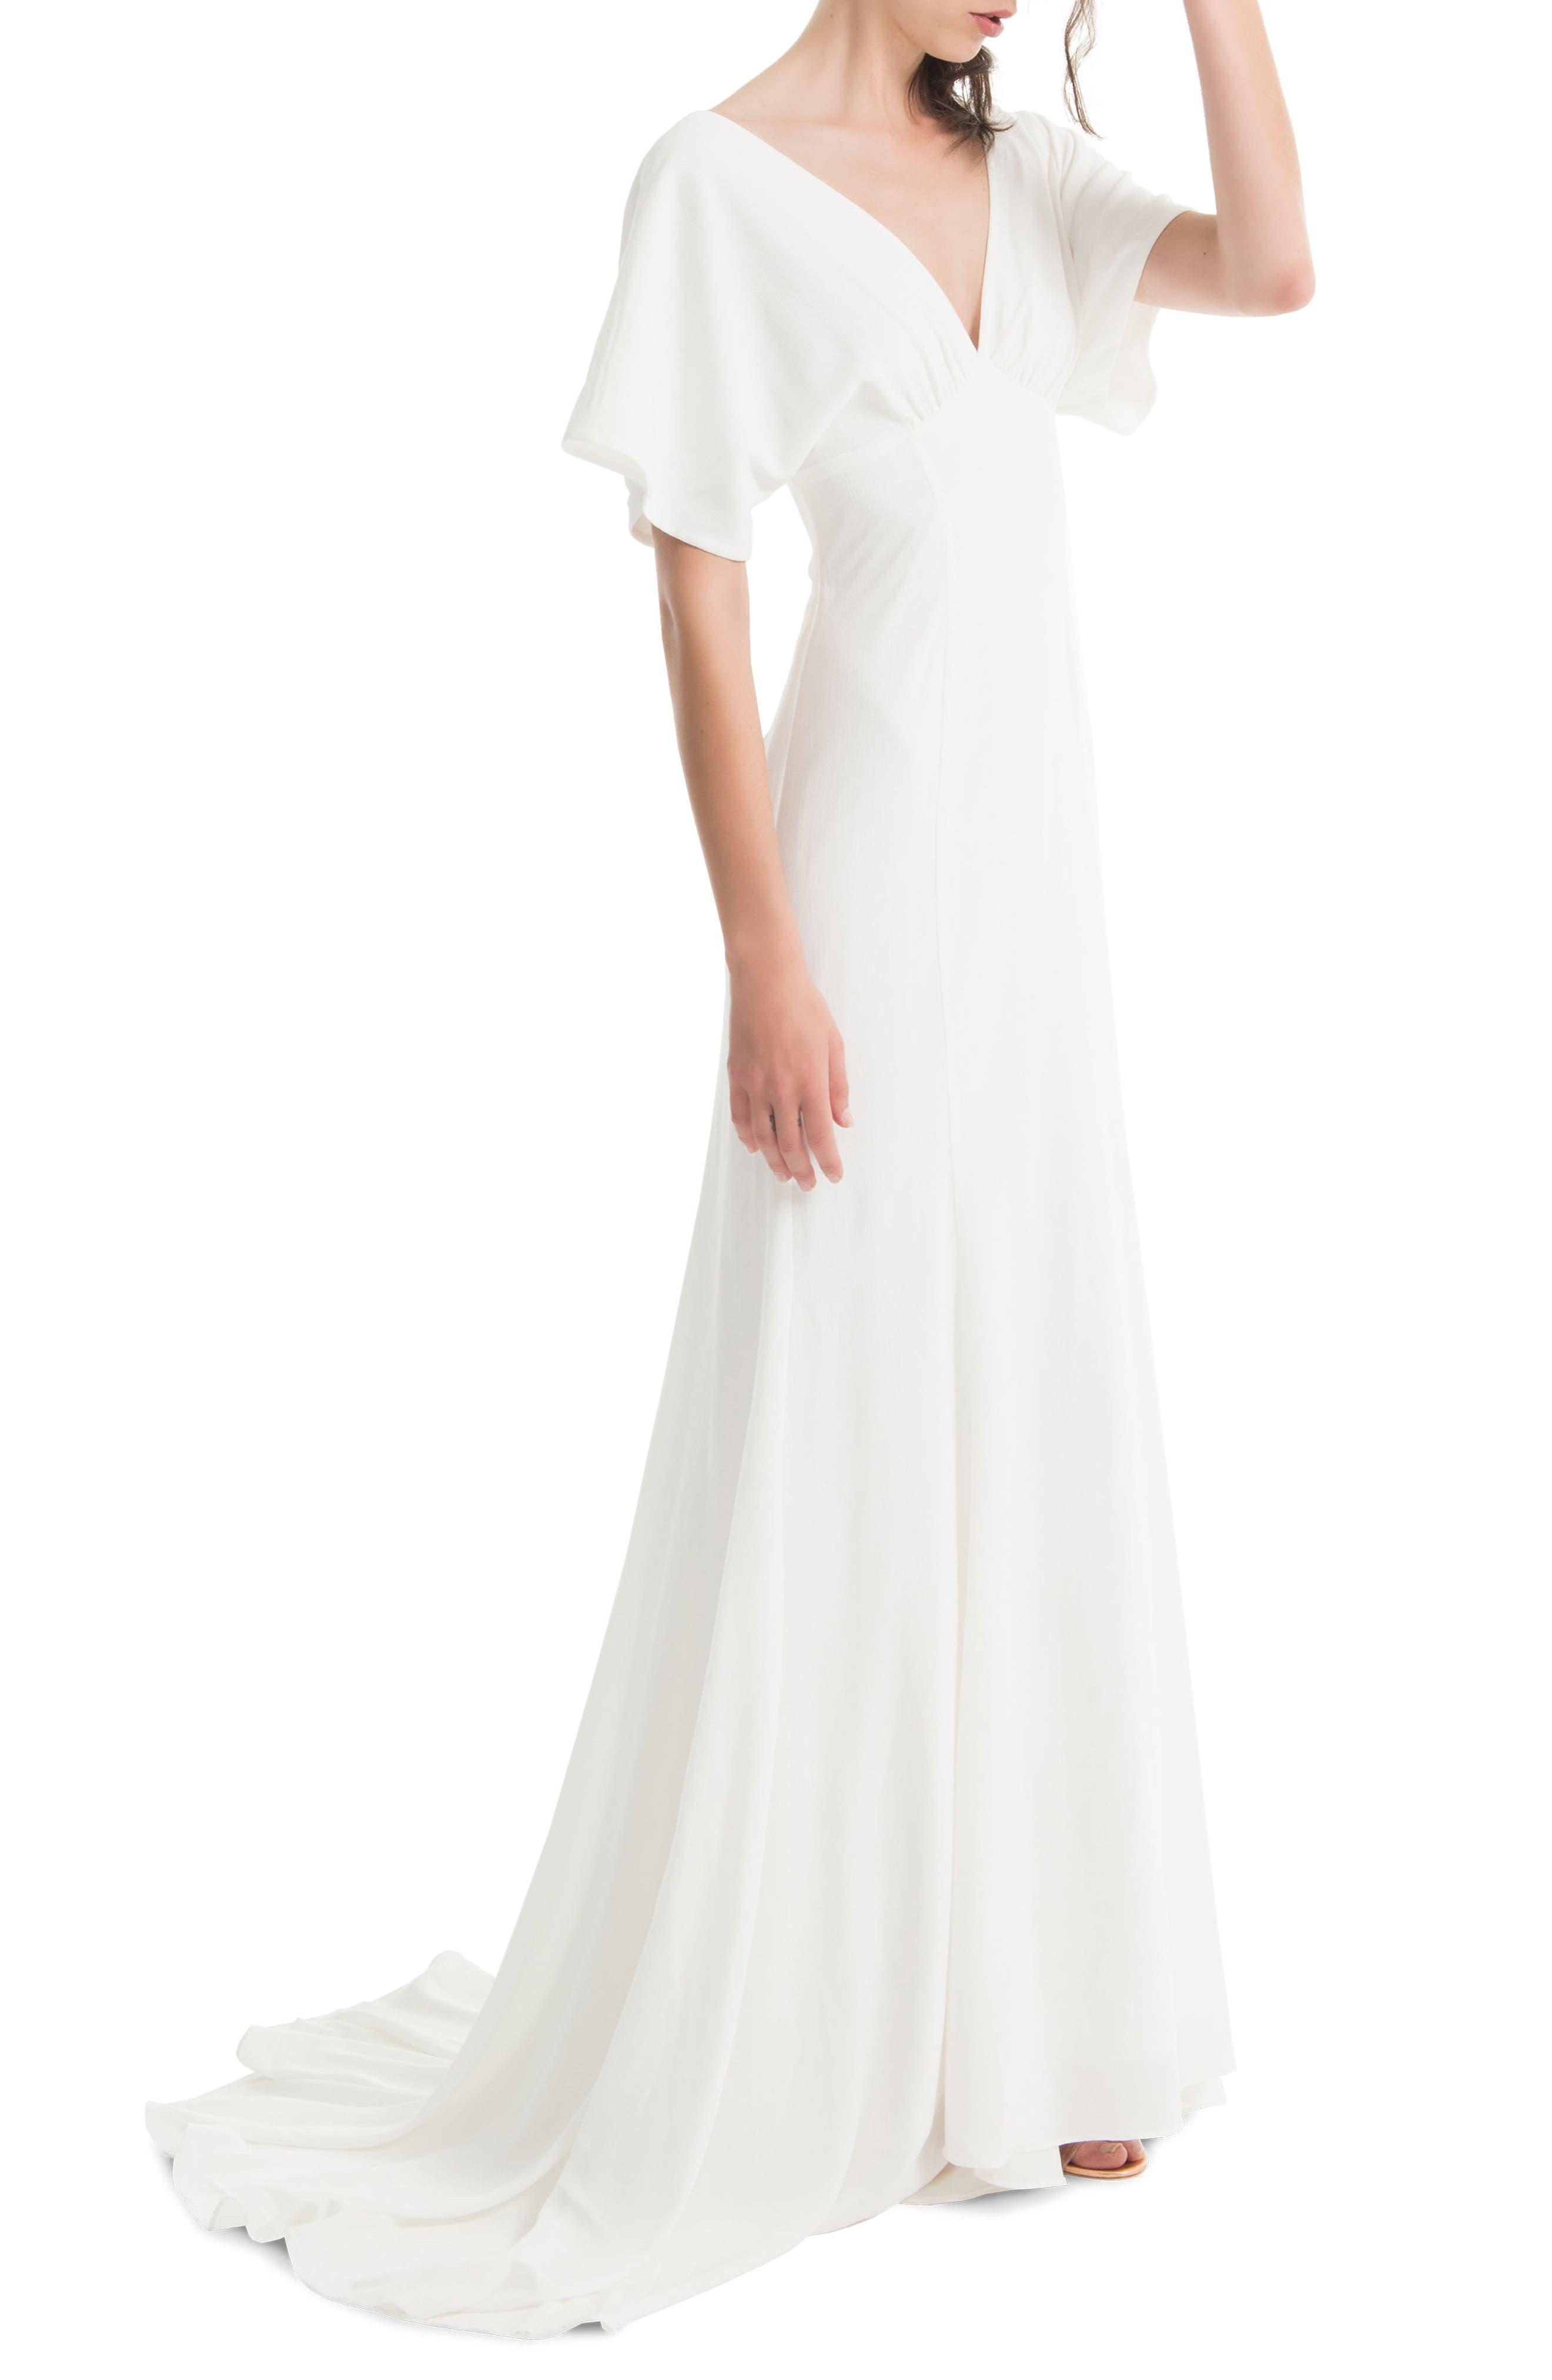 JOANNA AUGUST, Pattie Empire Waist Crepe Gown, Alternate thumbnail 3, color, WHITE